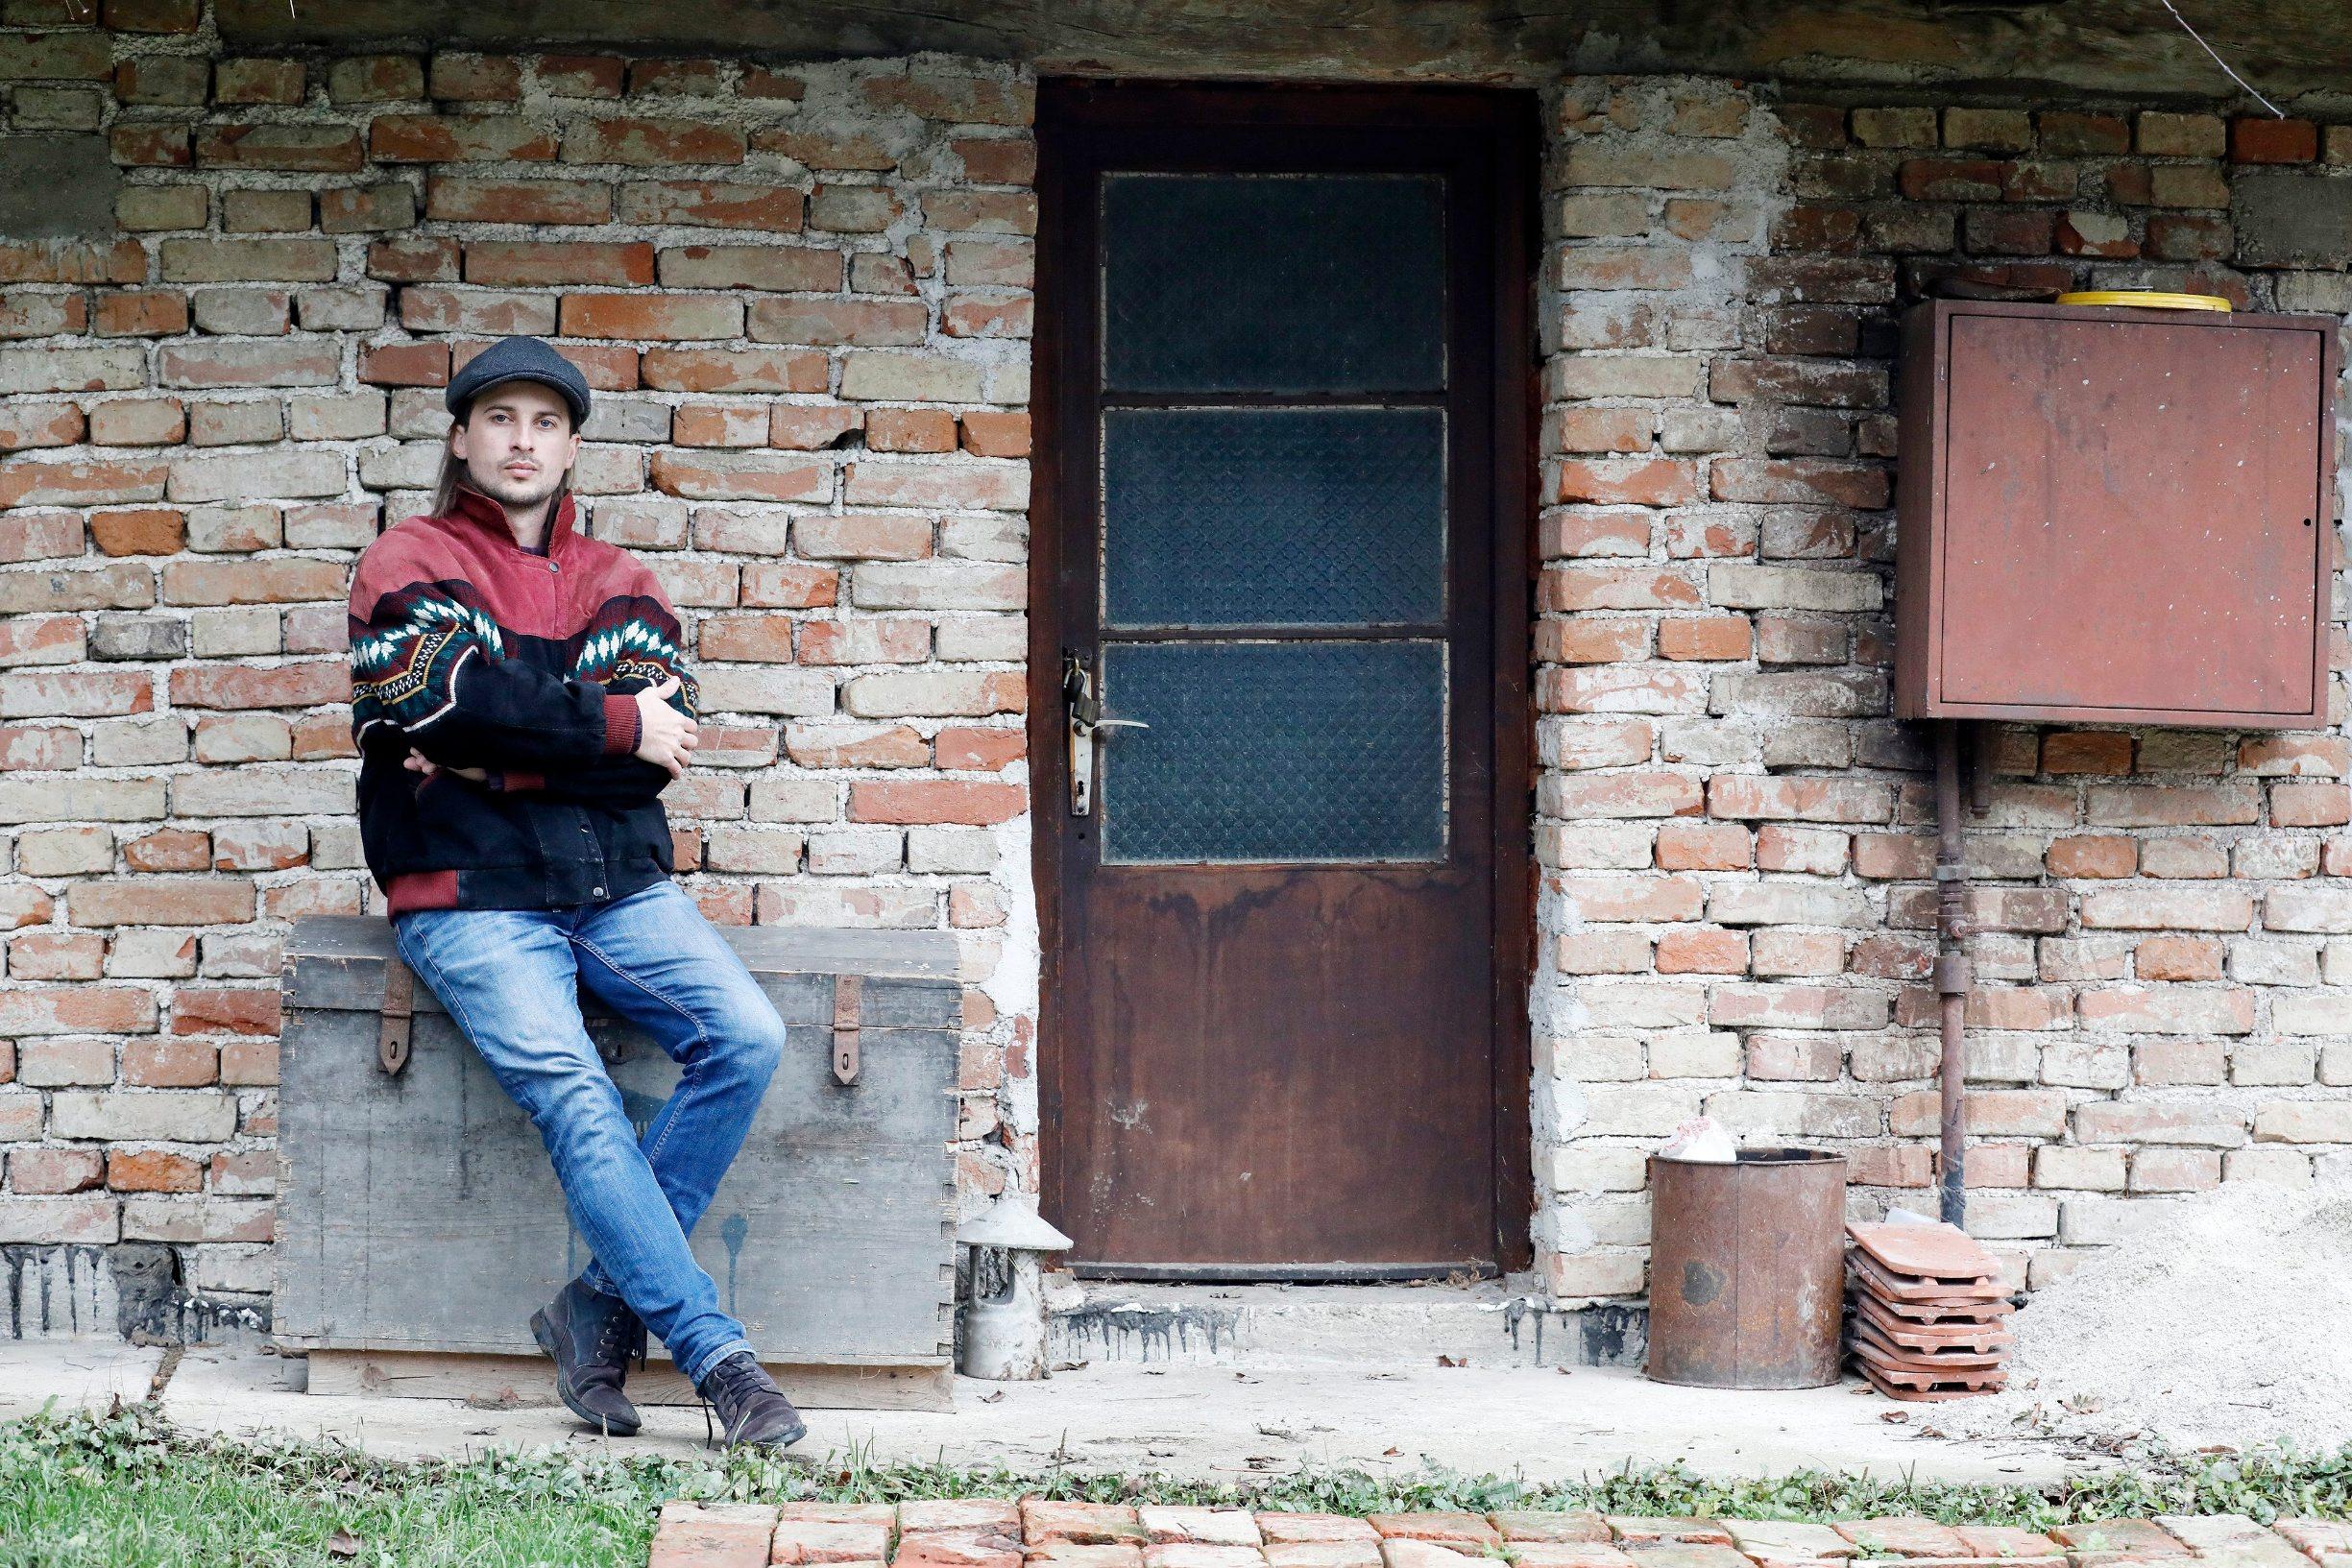 Zabok, 041219. Glazbenik Nikola Vranic, poznat pod umjetnickim imenom JR August. Na fotografiji: Nikola Vranic. Foto: Tomislav Kristo / CROPIX